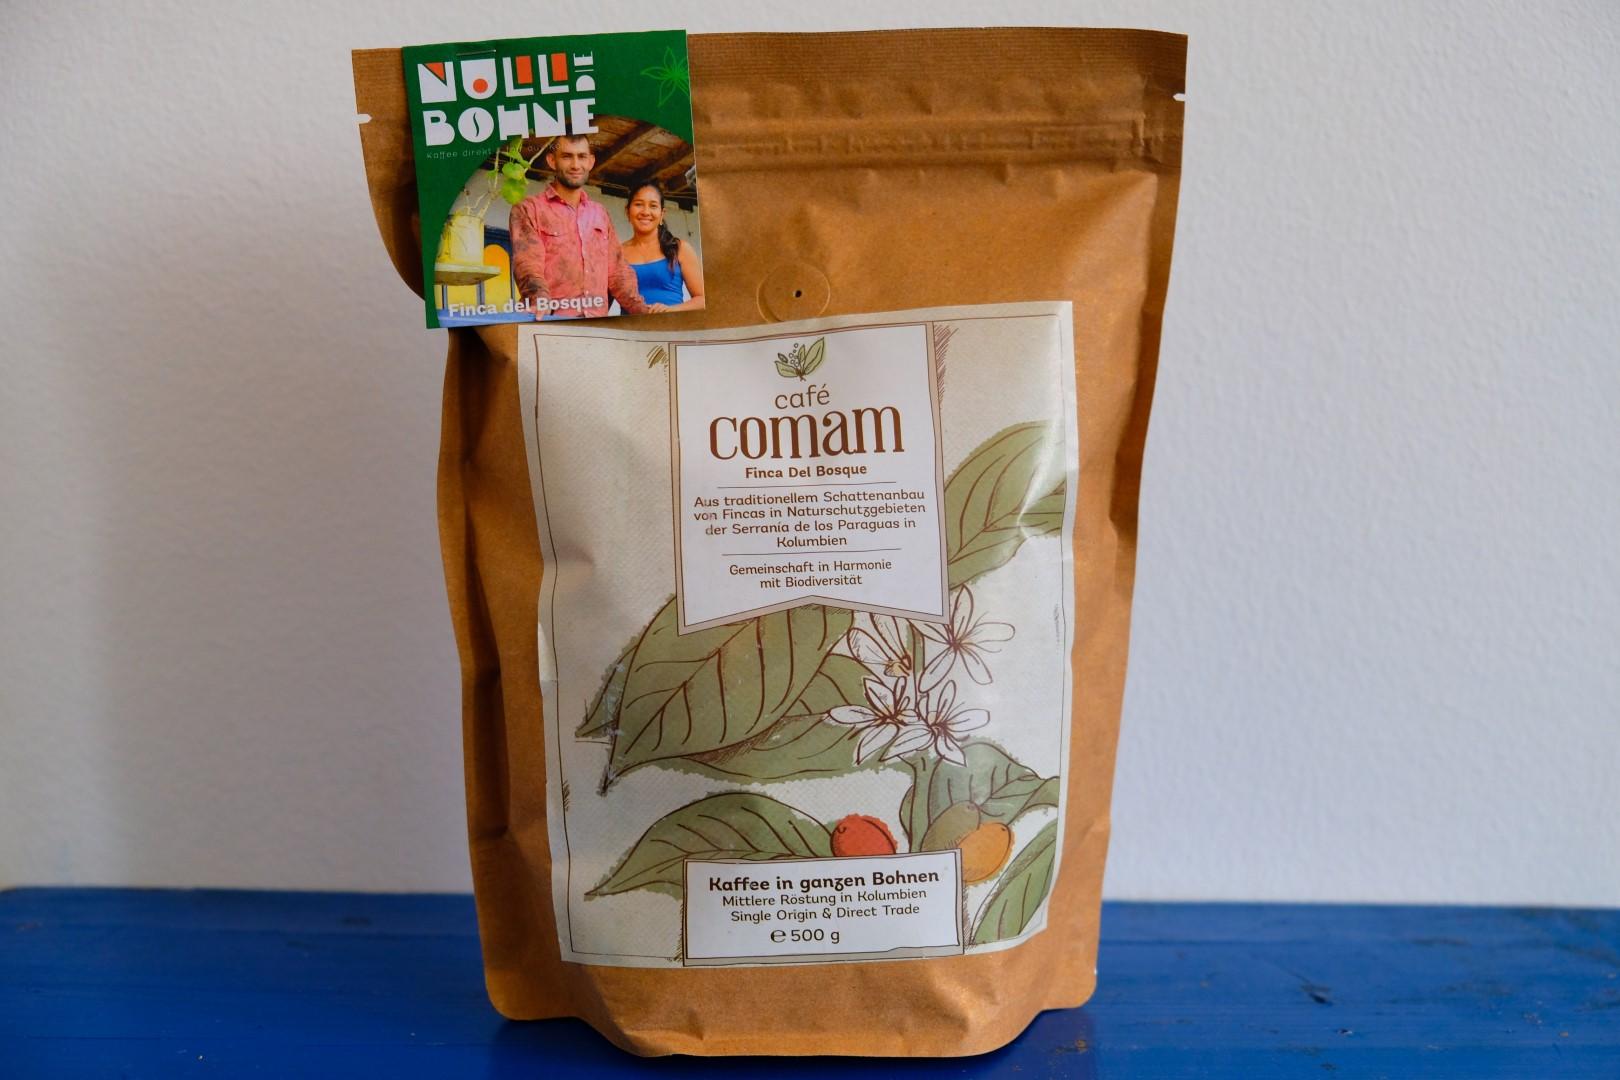 CAFÉ COMAM Finca del Bosque (#2)